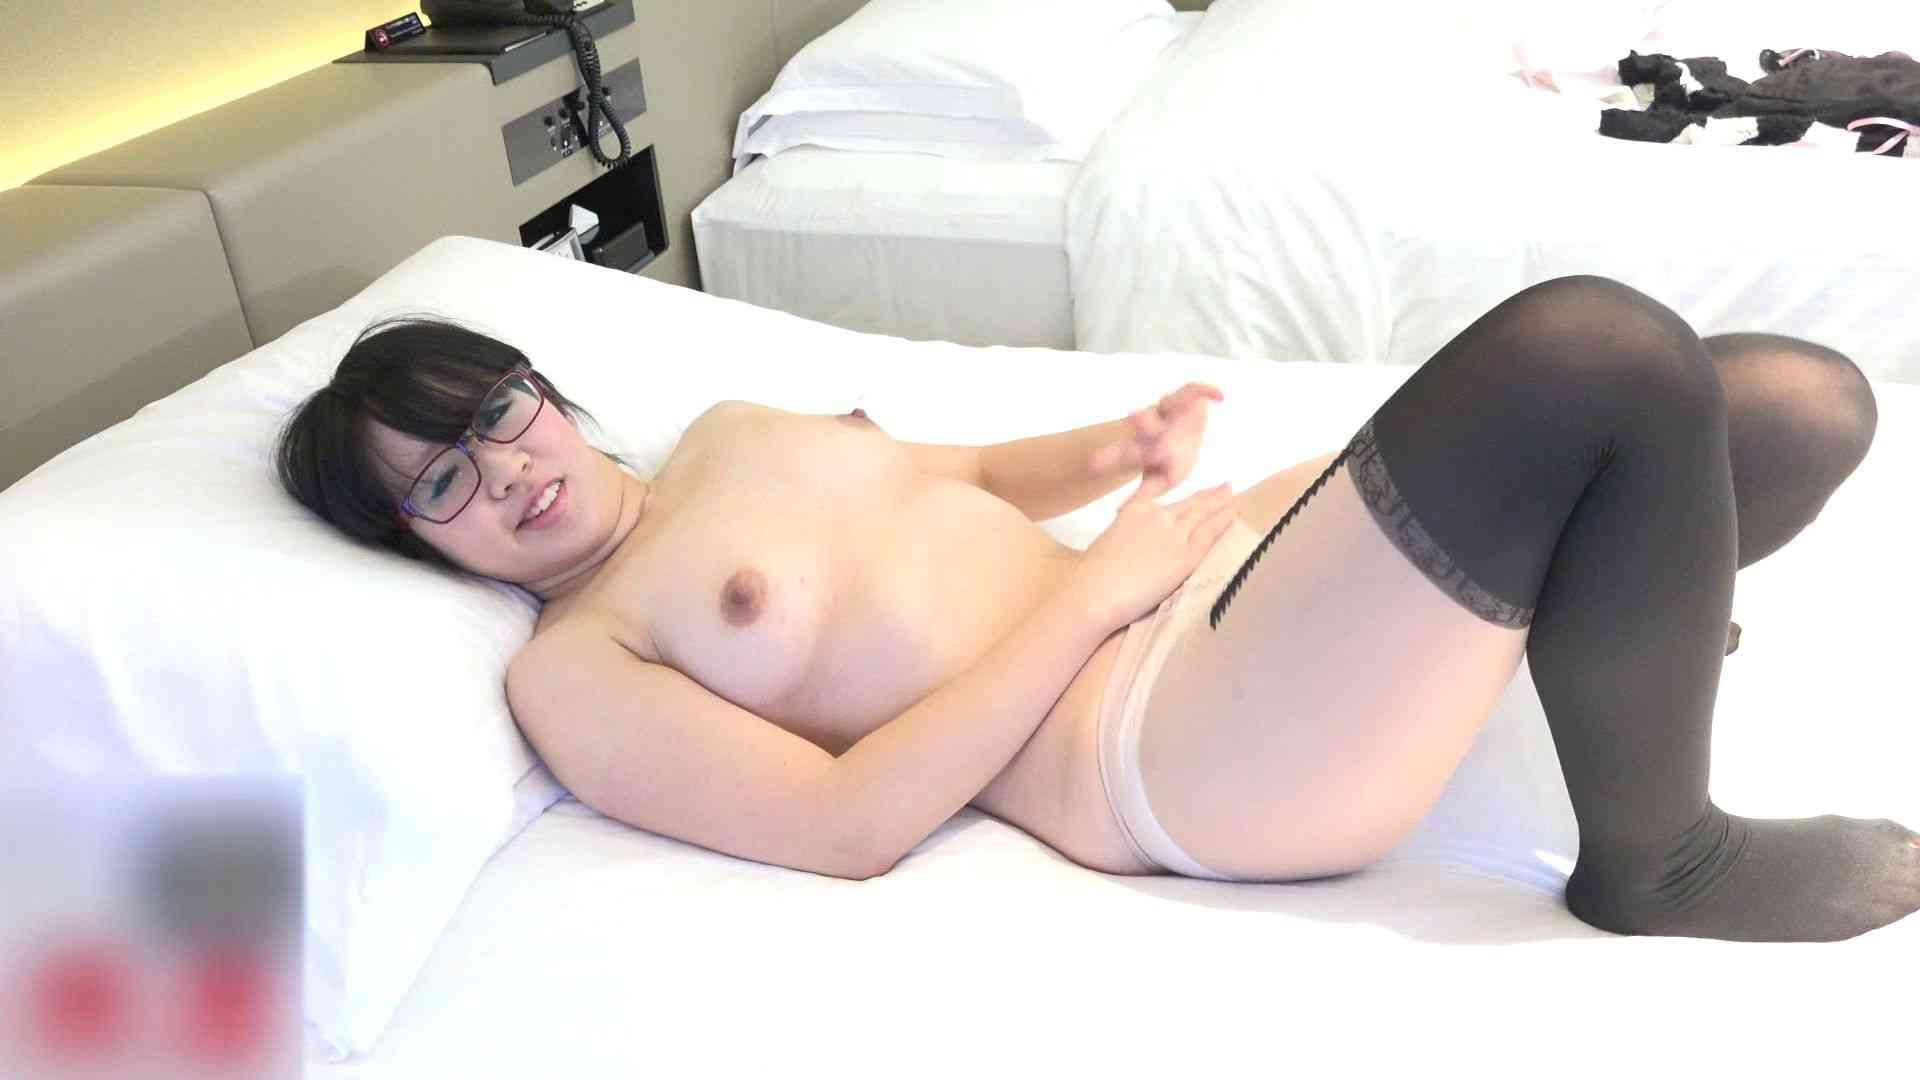 S級厳選美女ビッチガールVol.39 前編 0 | 0  112画像 100